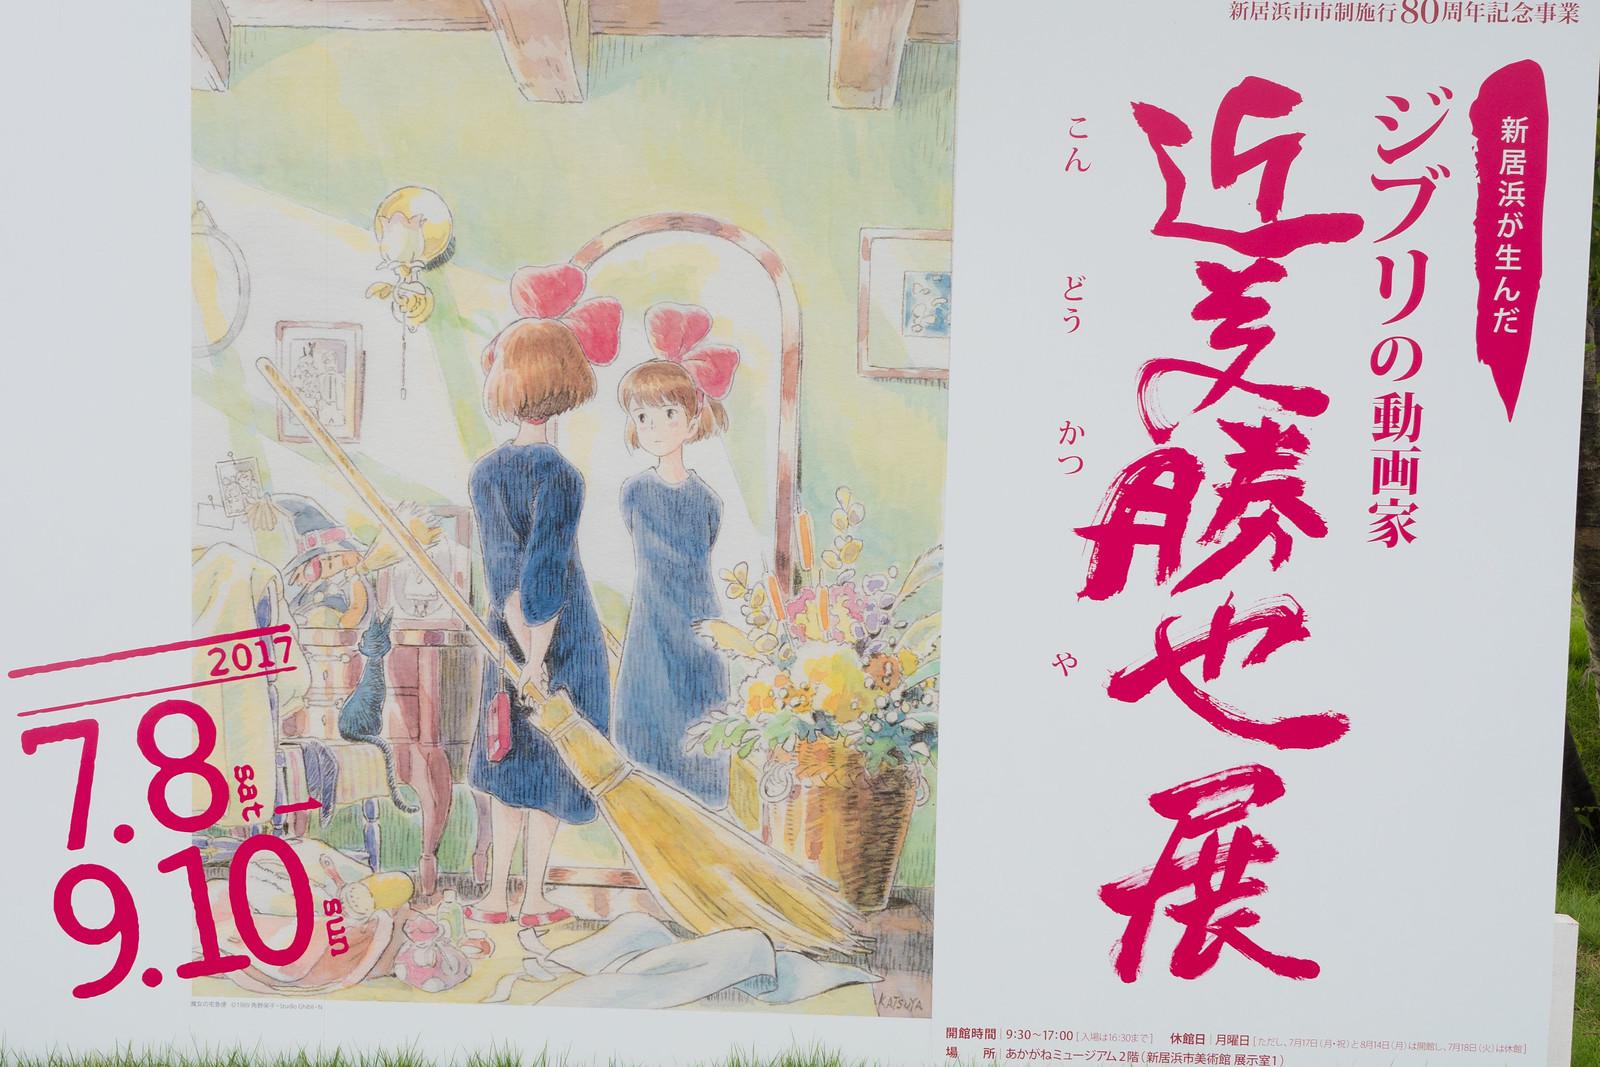 Ghibli_katsuyakondo-50